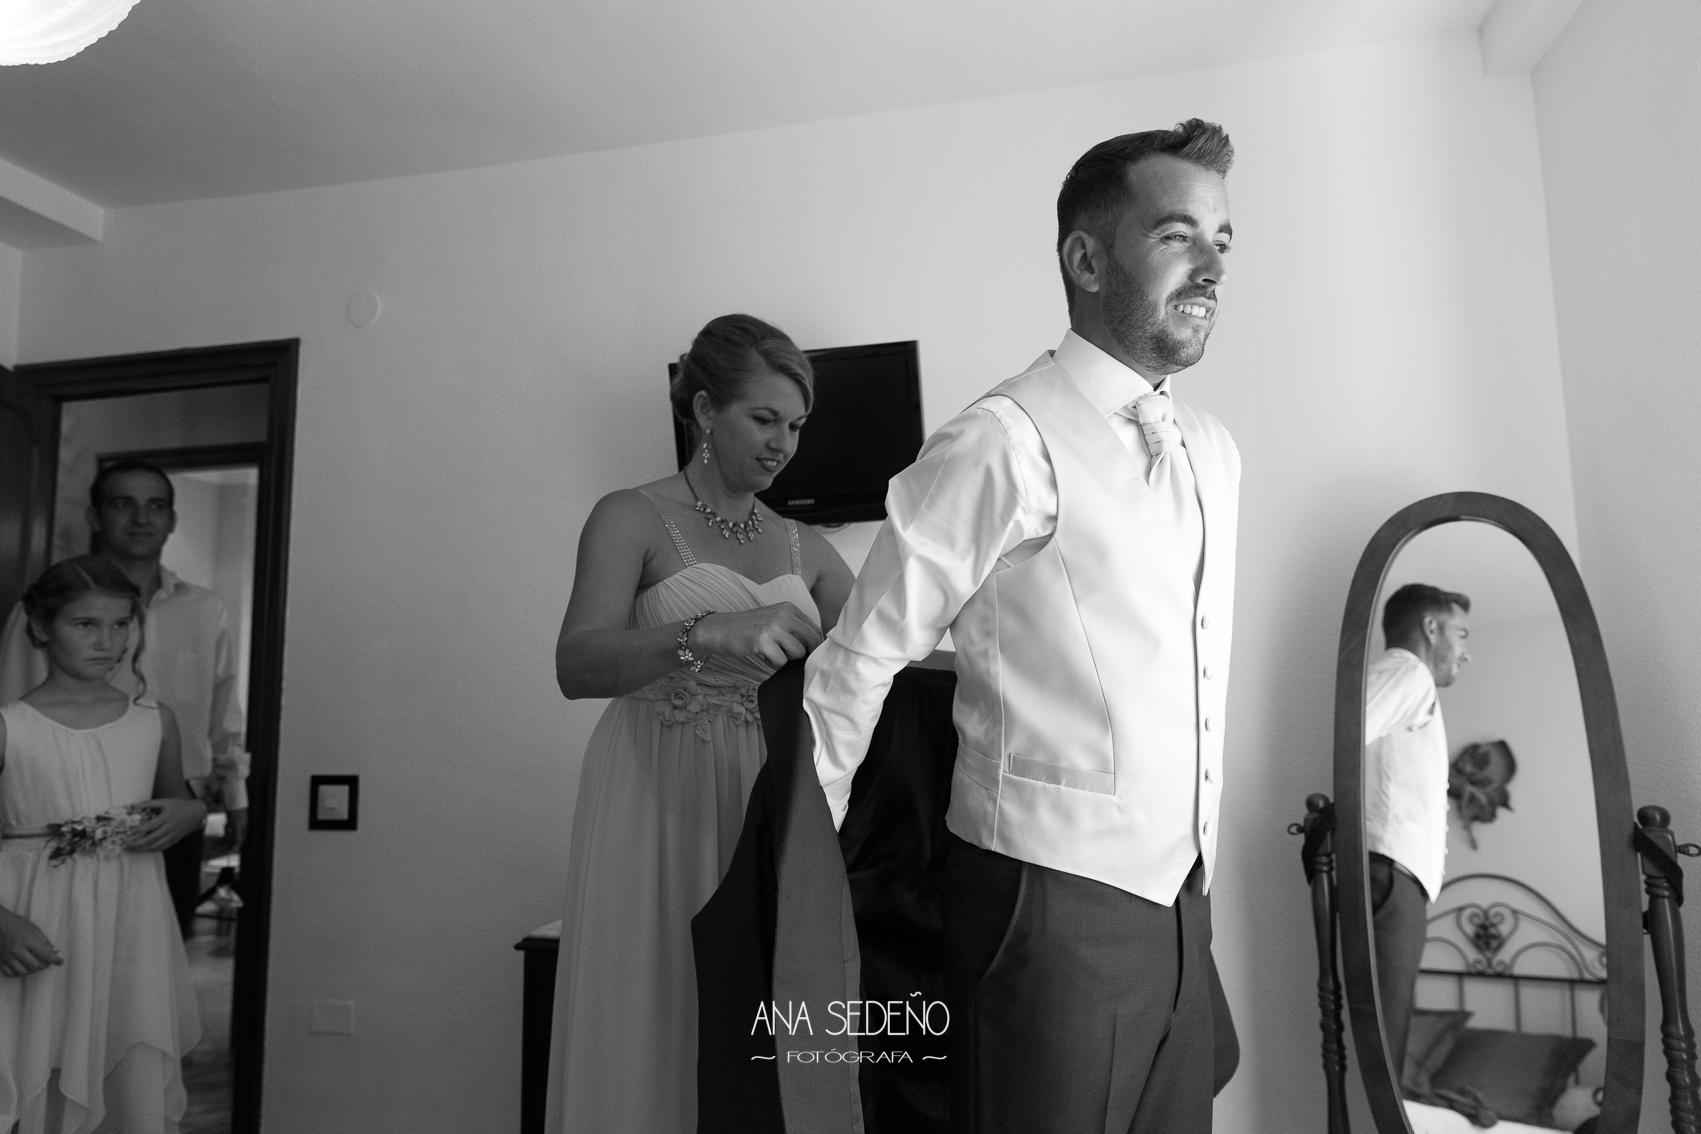 Ana Sedeño Fotografa.-Boda A&V0137